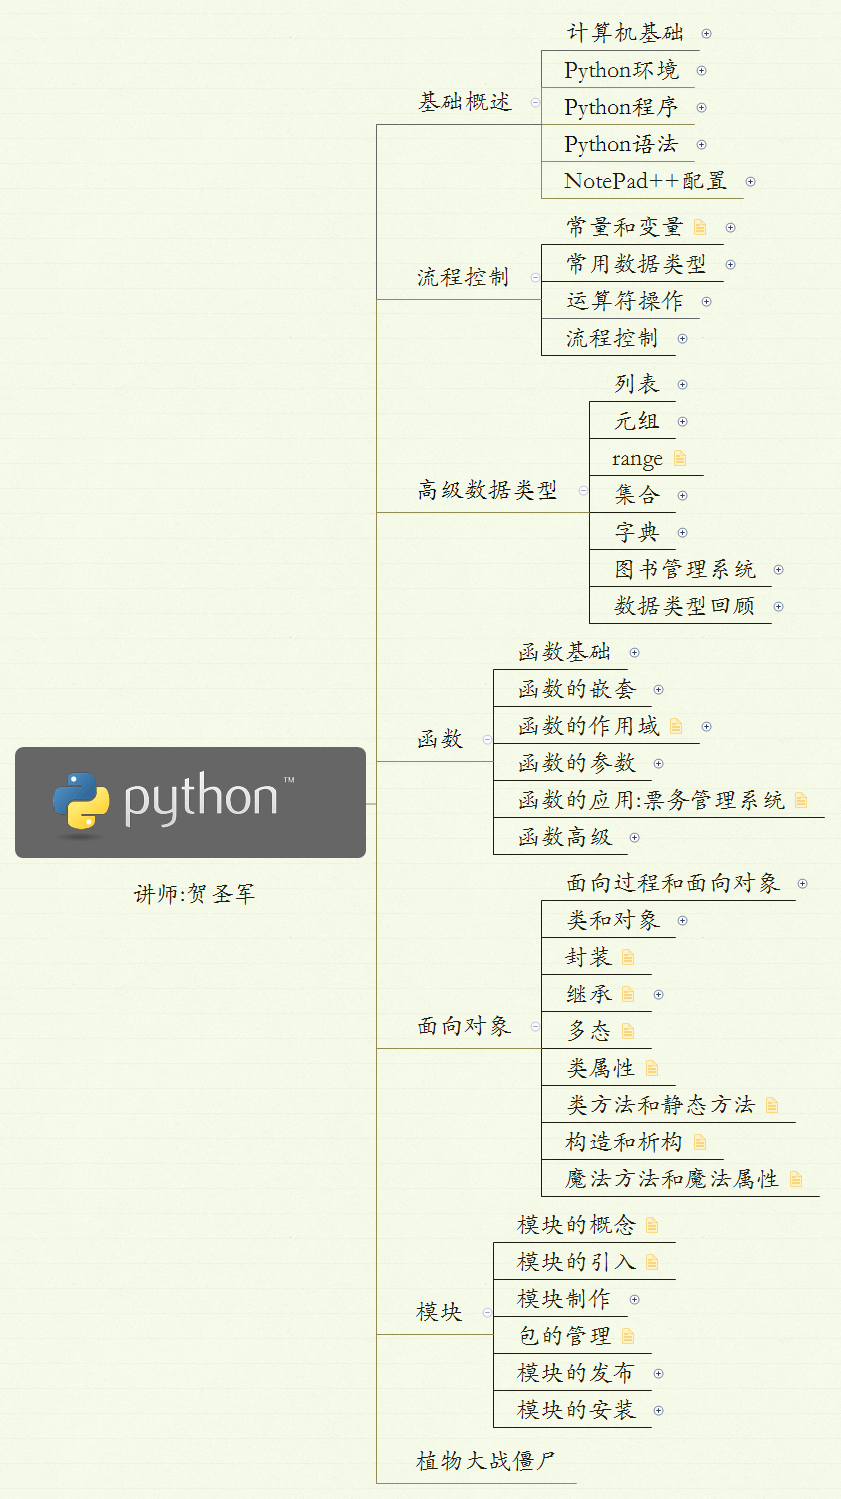 Python轻松入门到项目实战教程-苹果ID共享网